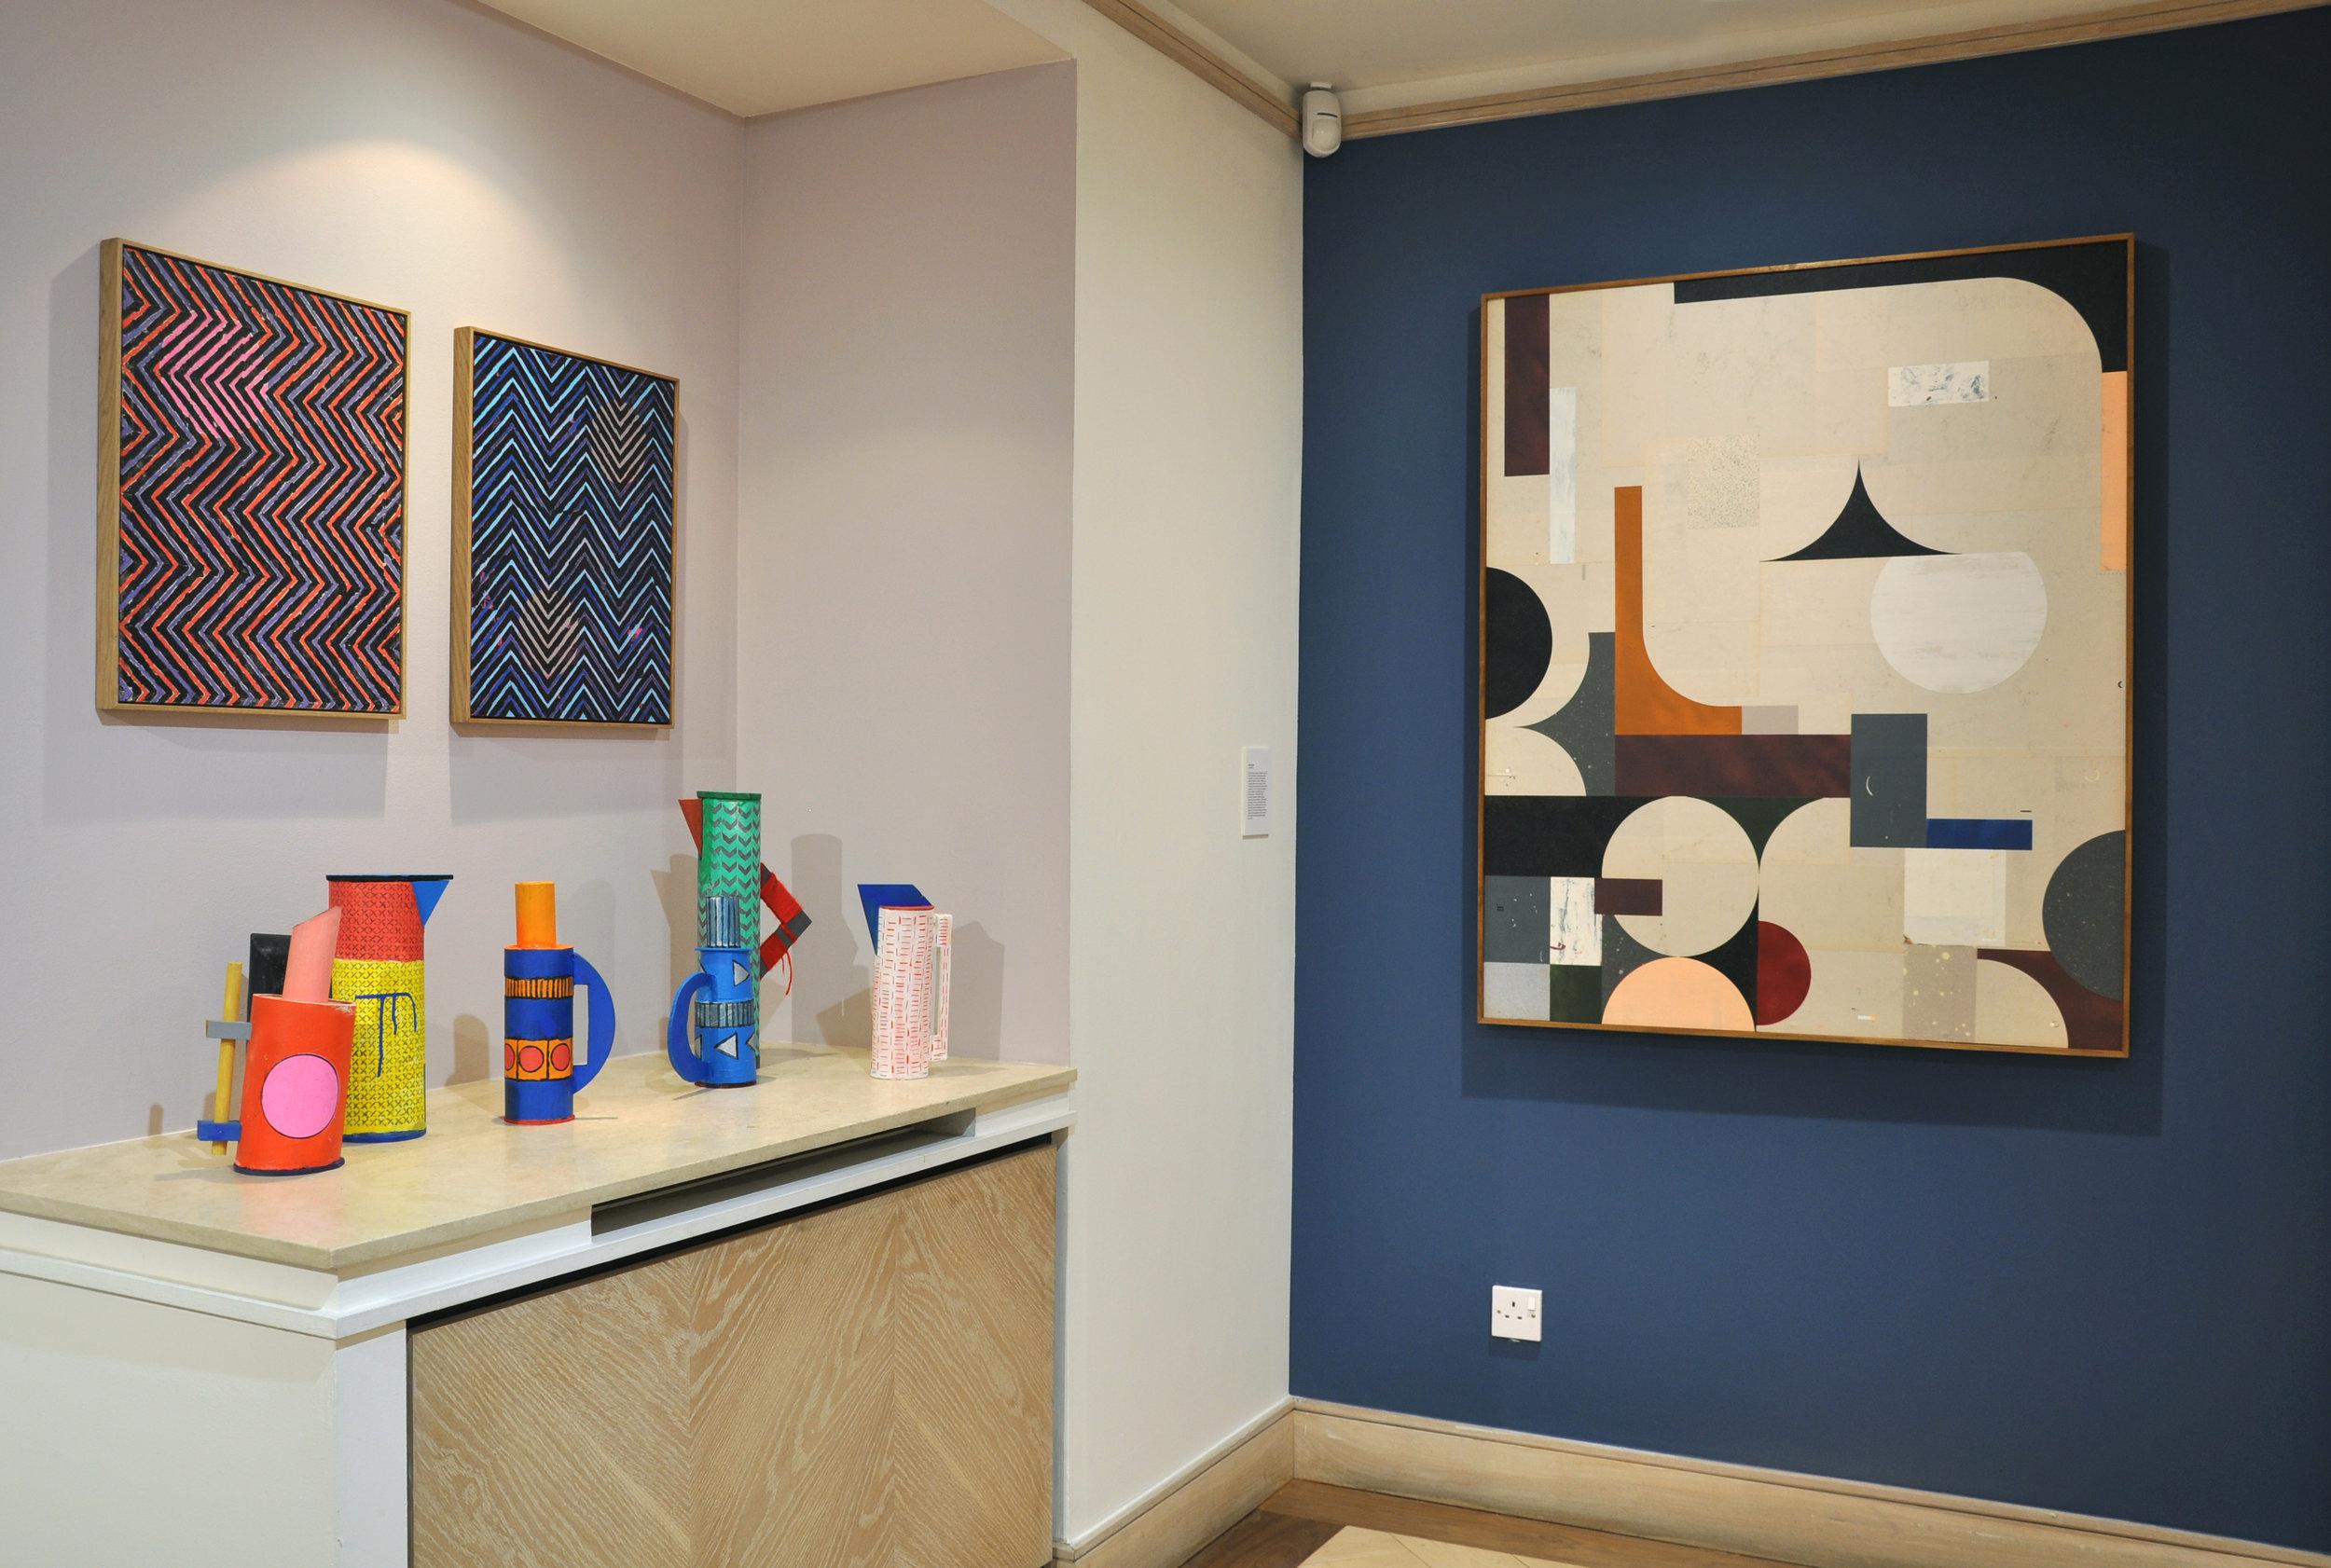 Domininc Beattie and Fabio Almeida.Installation at Collyer Bristow Gallery. Photo courtesy of Michaela Nettell.DSC_7566.jpg